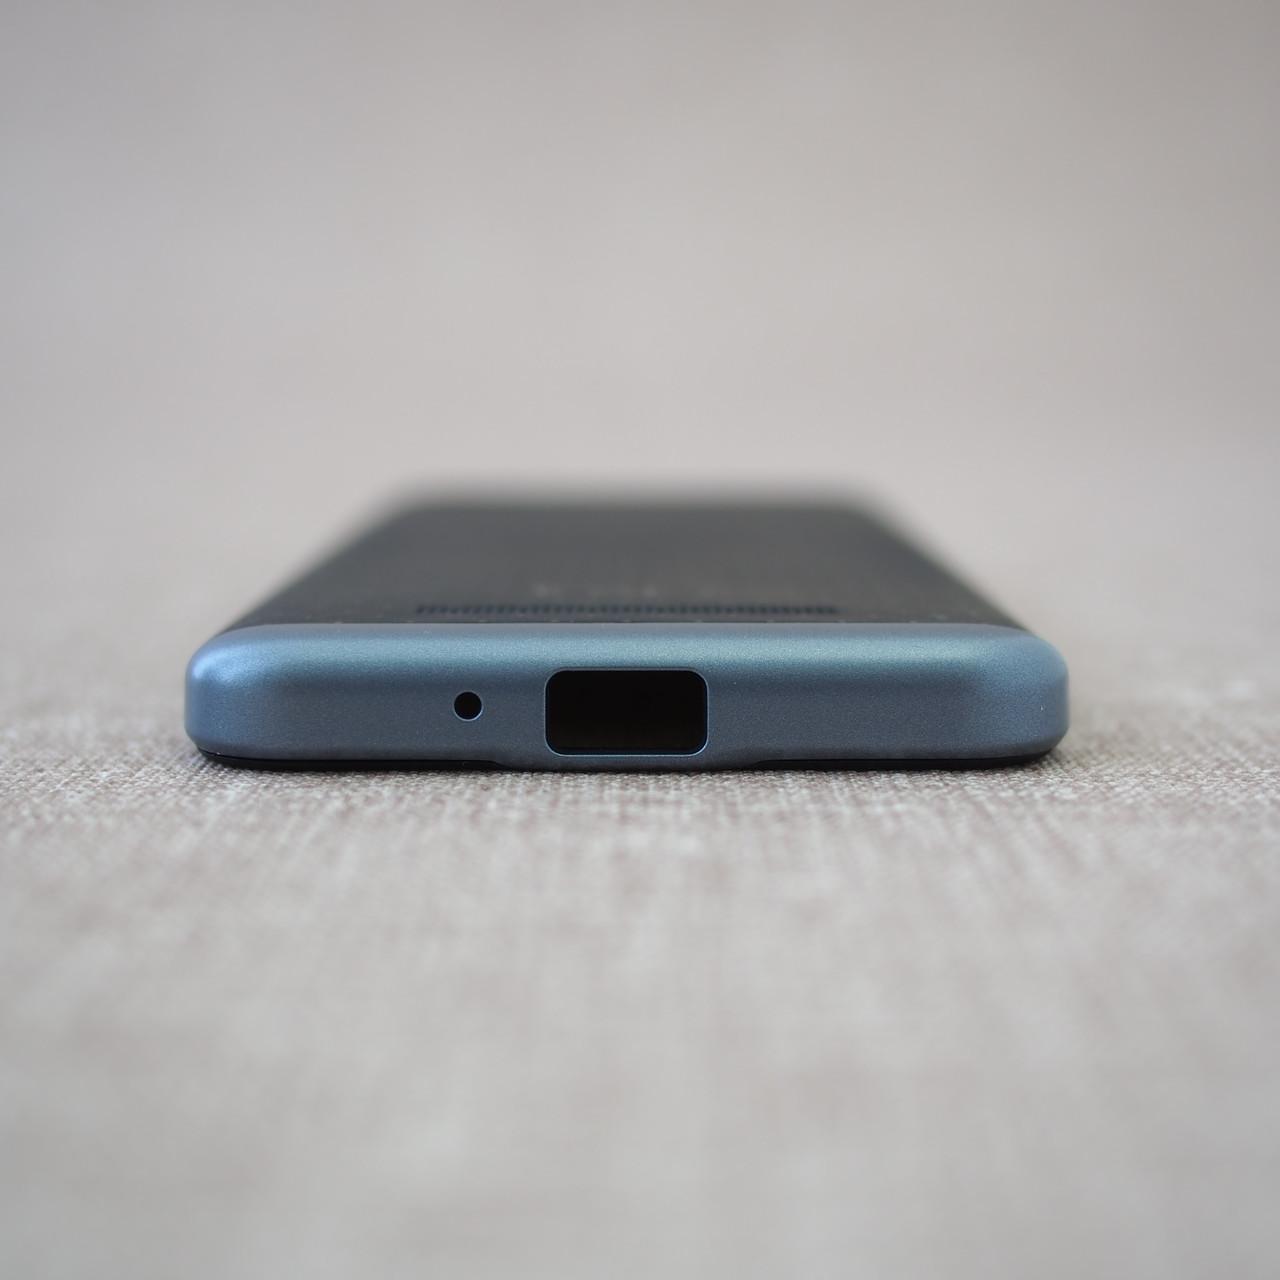 Чехол iPaky Xiaomi Redmi 4a grey 4A Для телефона Серый